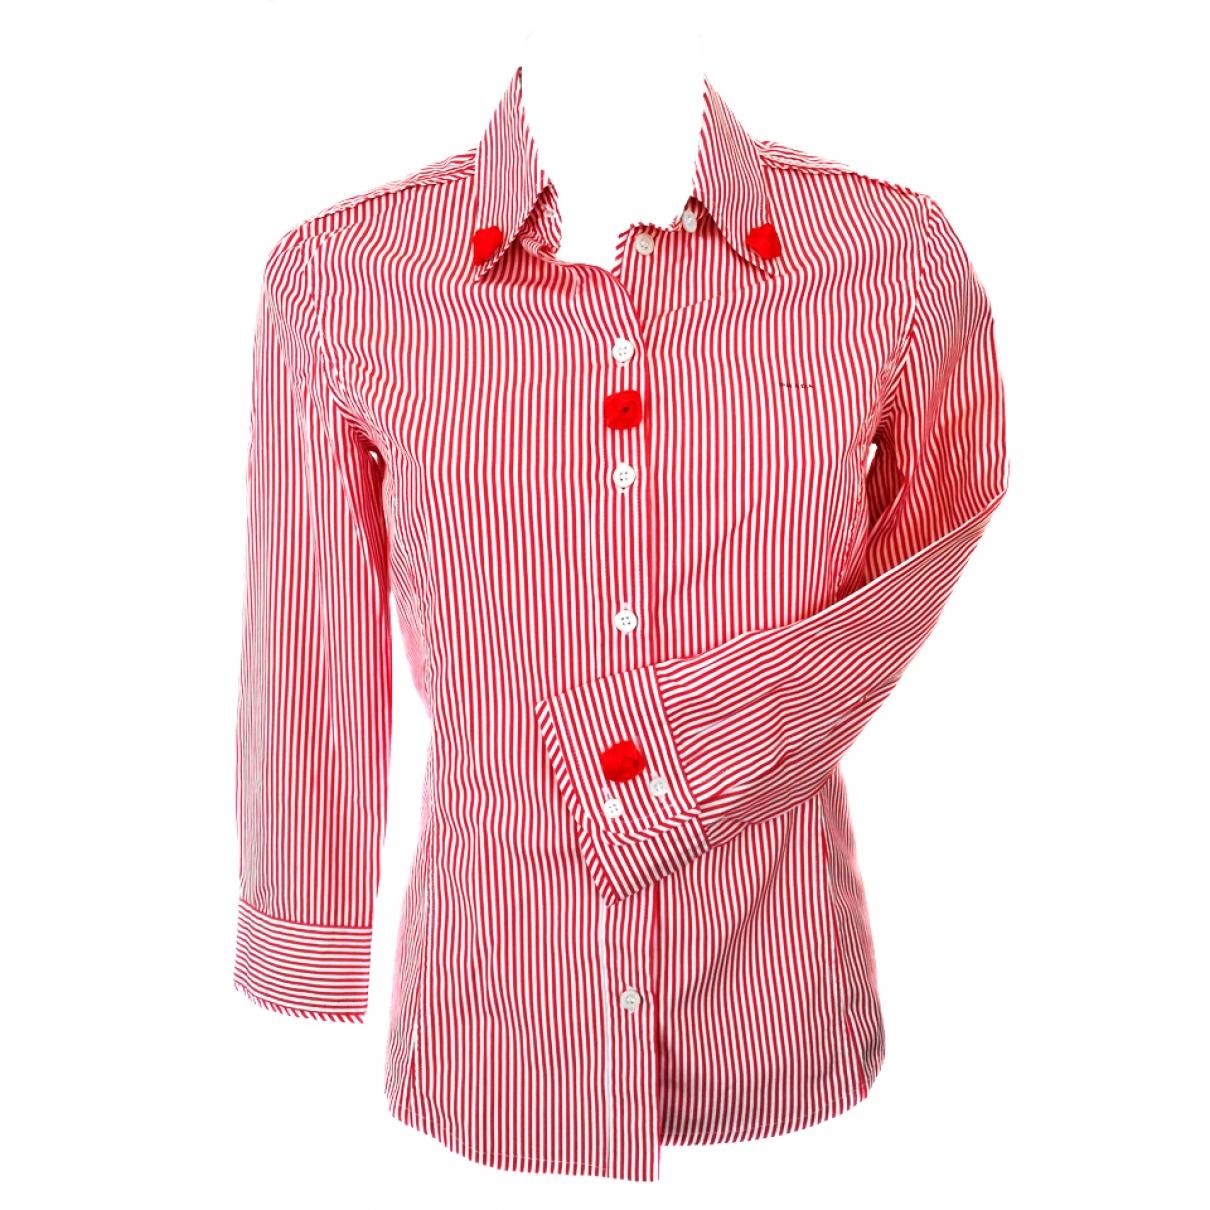 Prada \N Red Cotton  top for Women 40 IT